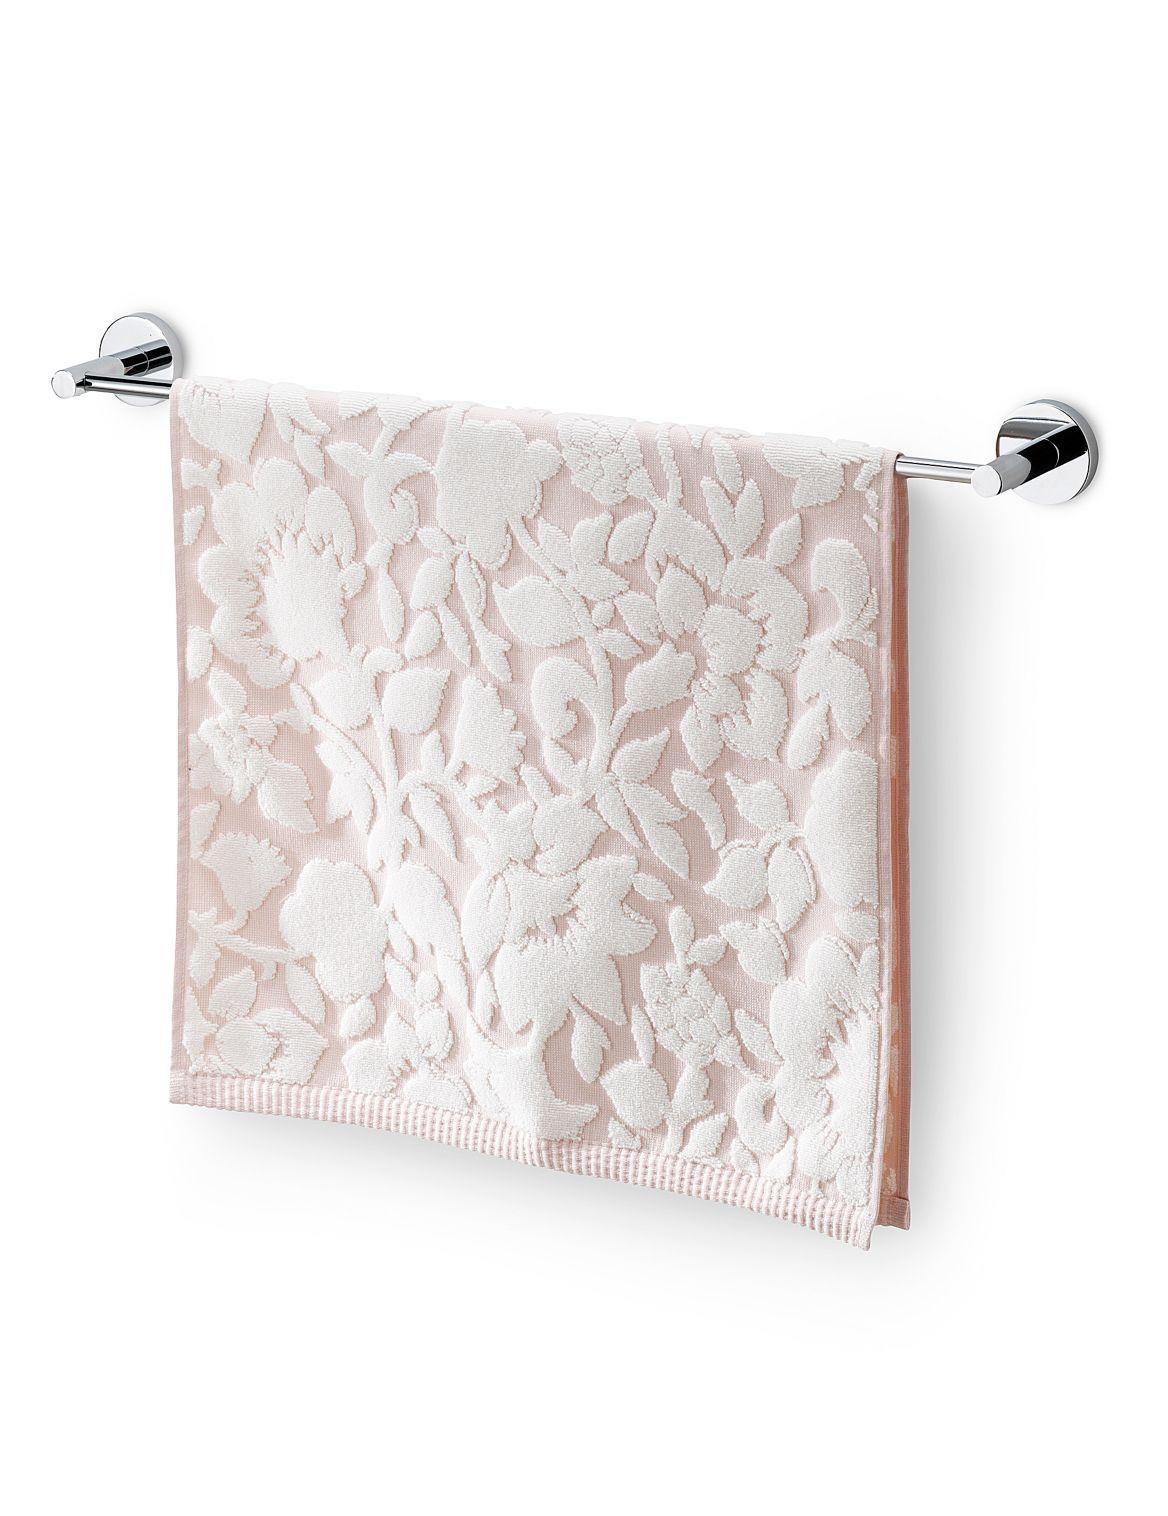 Marks and Spencer - Serviette de bain fleurie